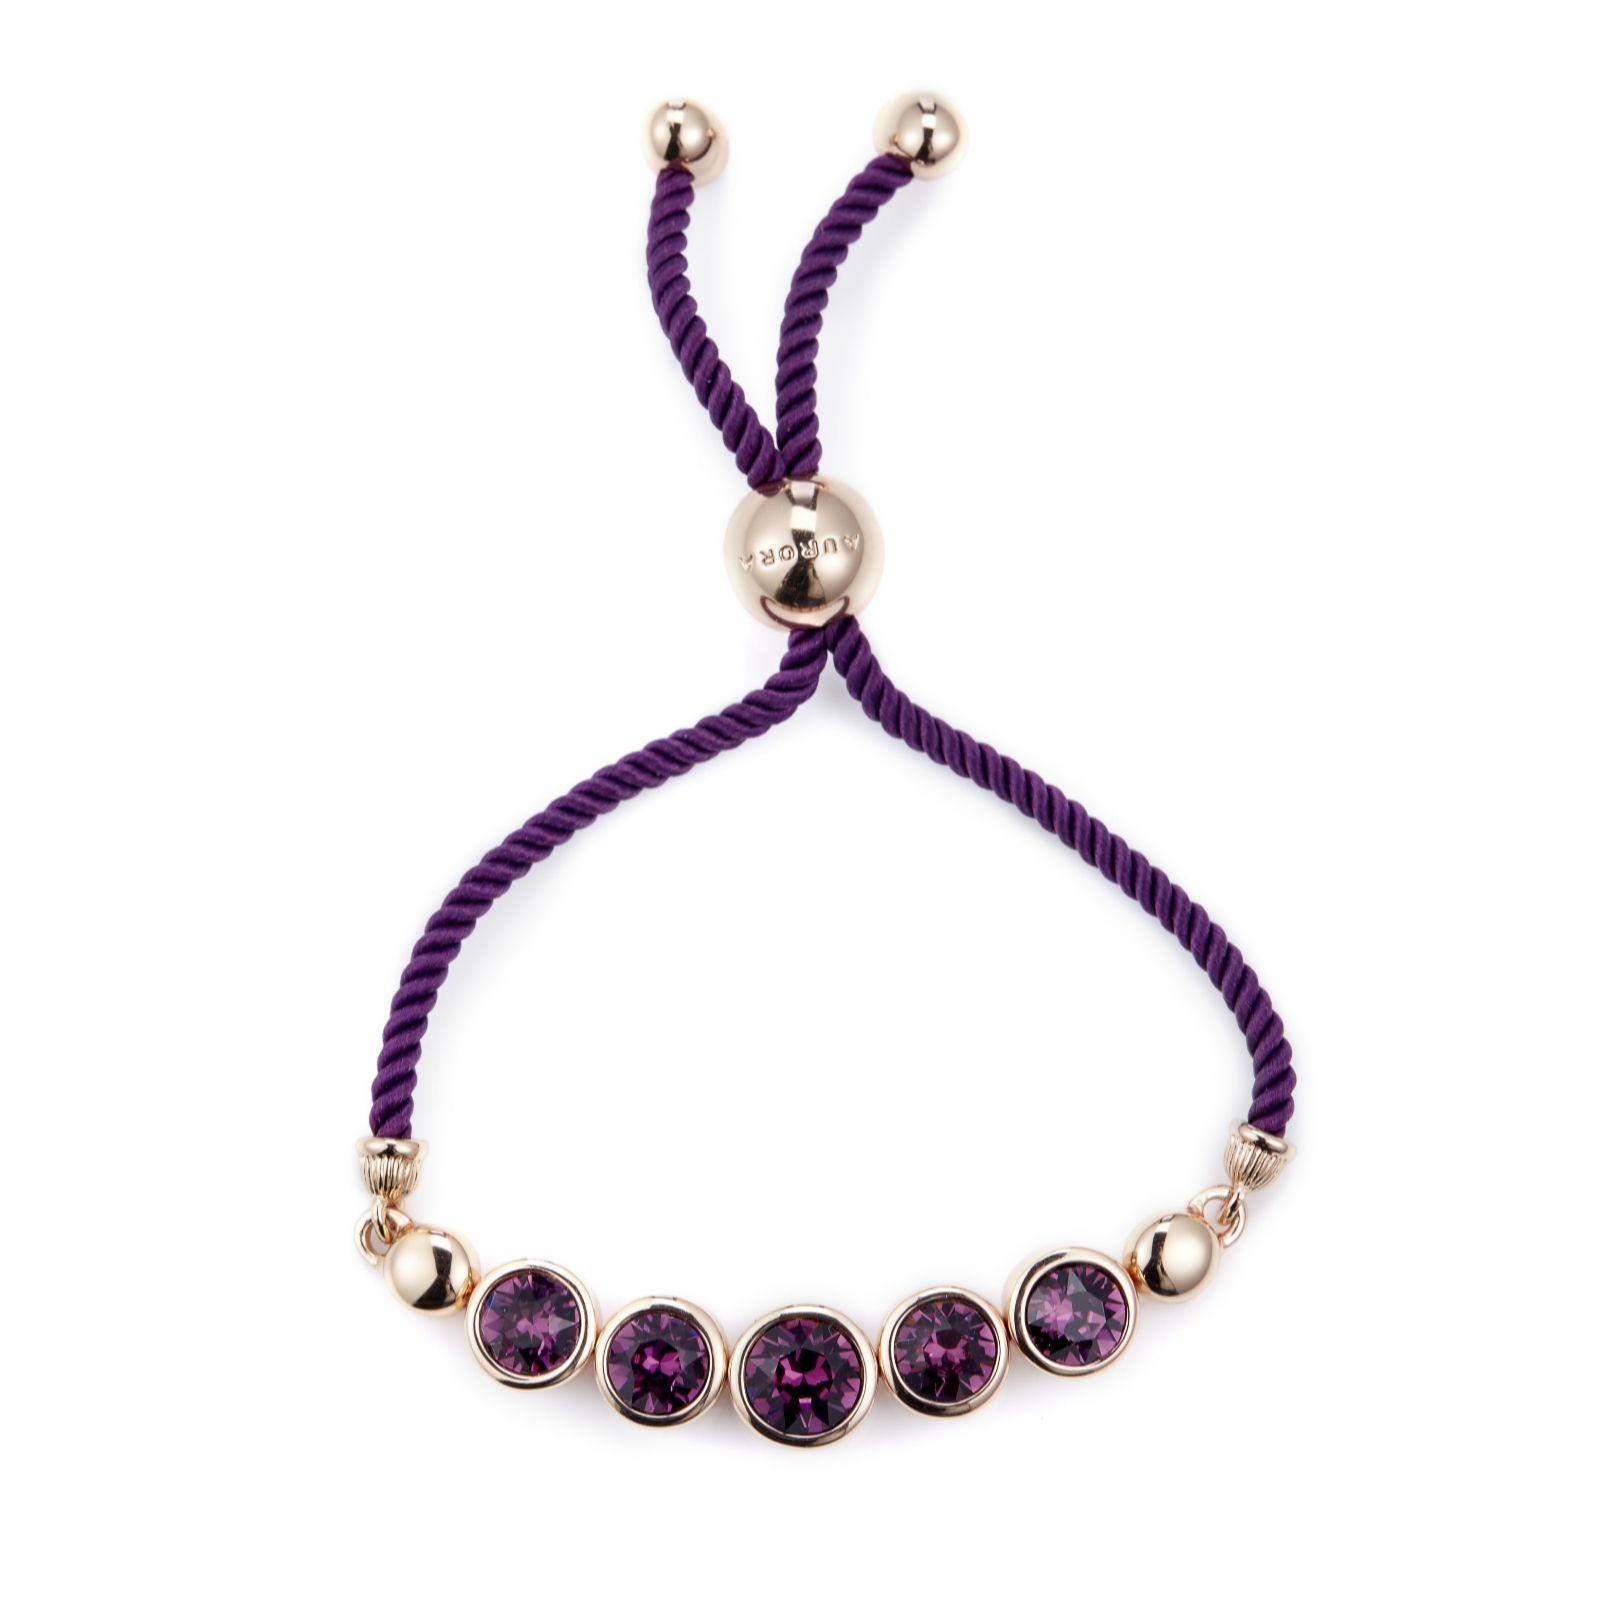 c6f25916498 Aurora Swarovski Crystal Faceted Friendship Bracelet - Page 1 - QVC UK